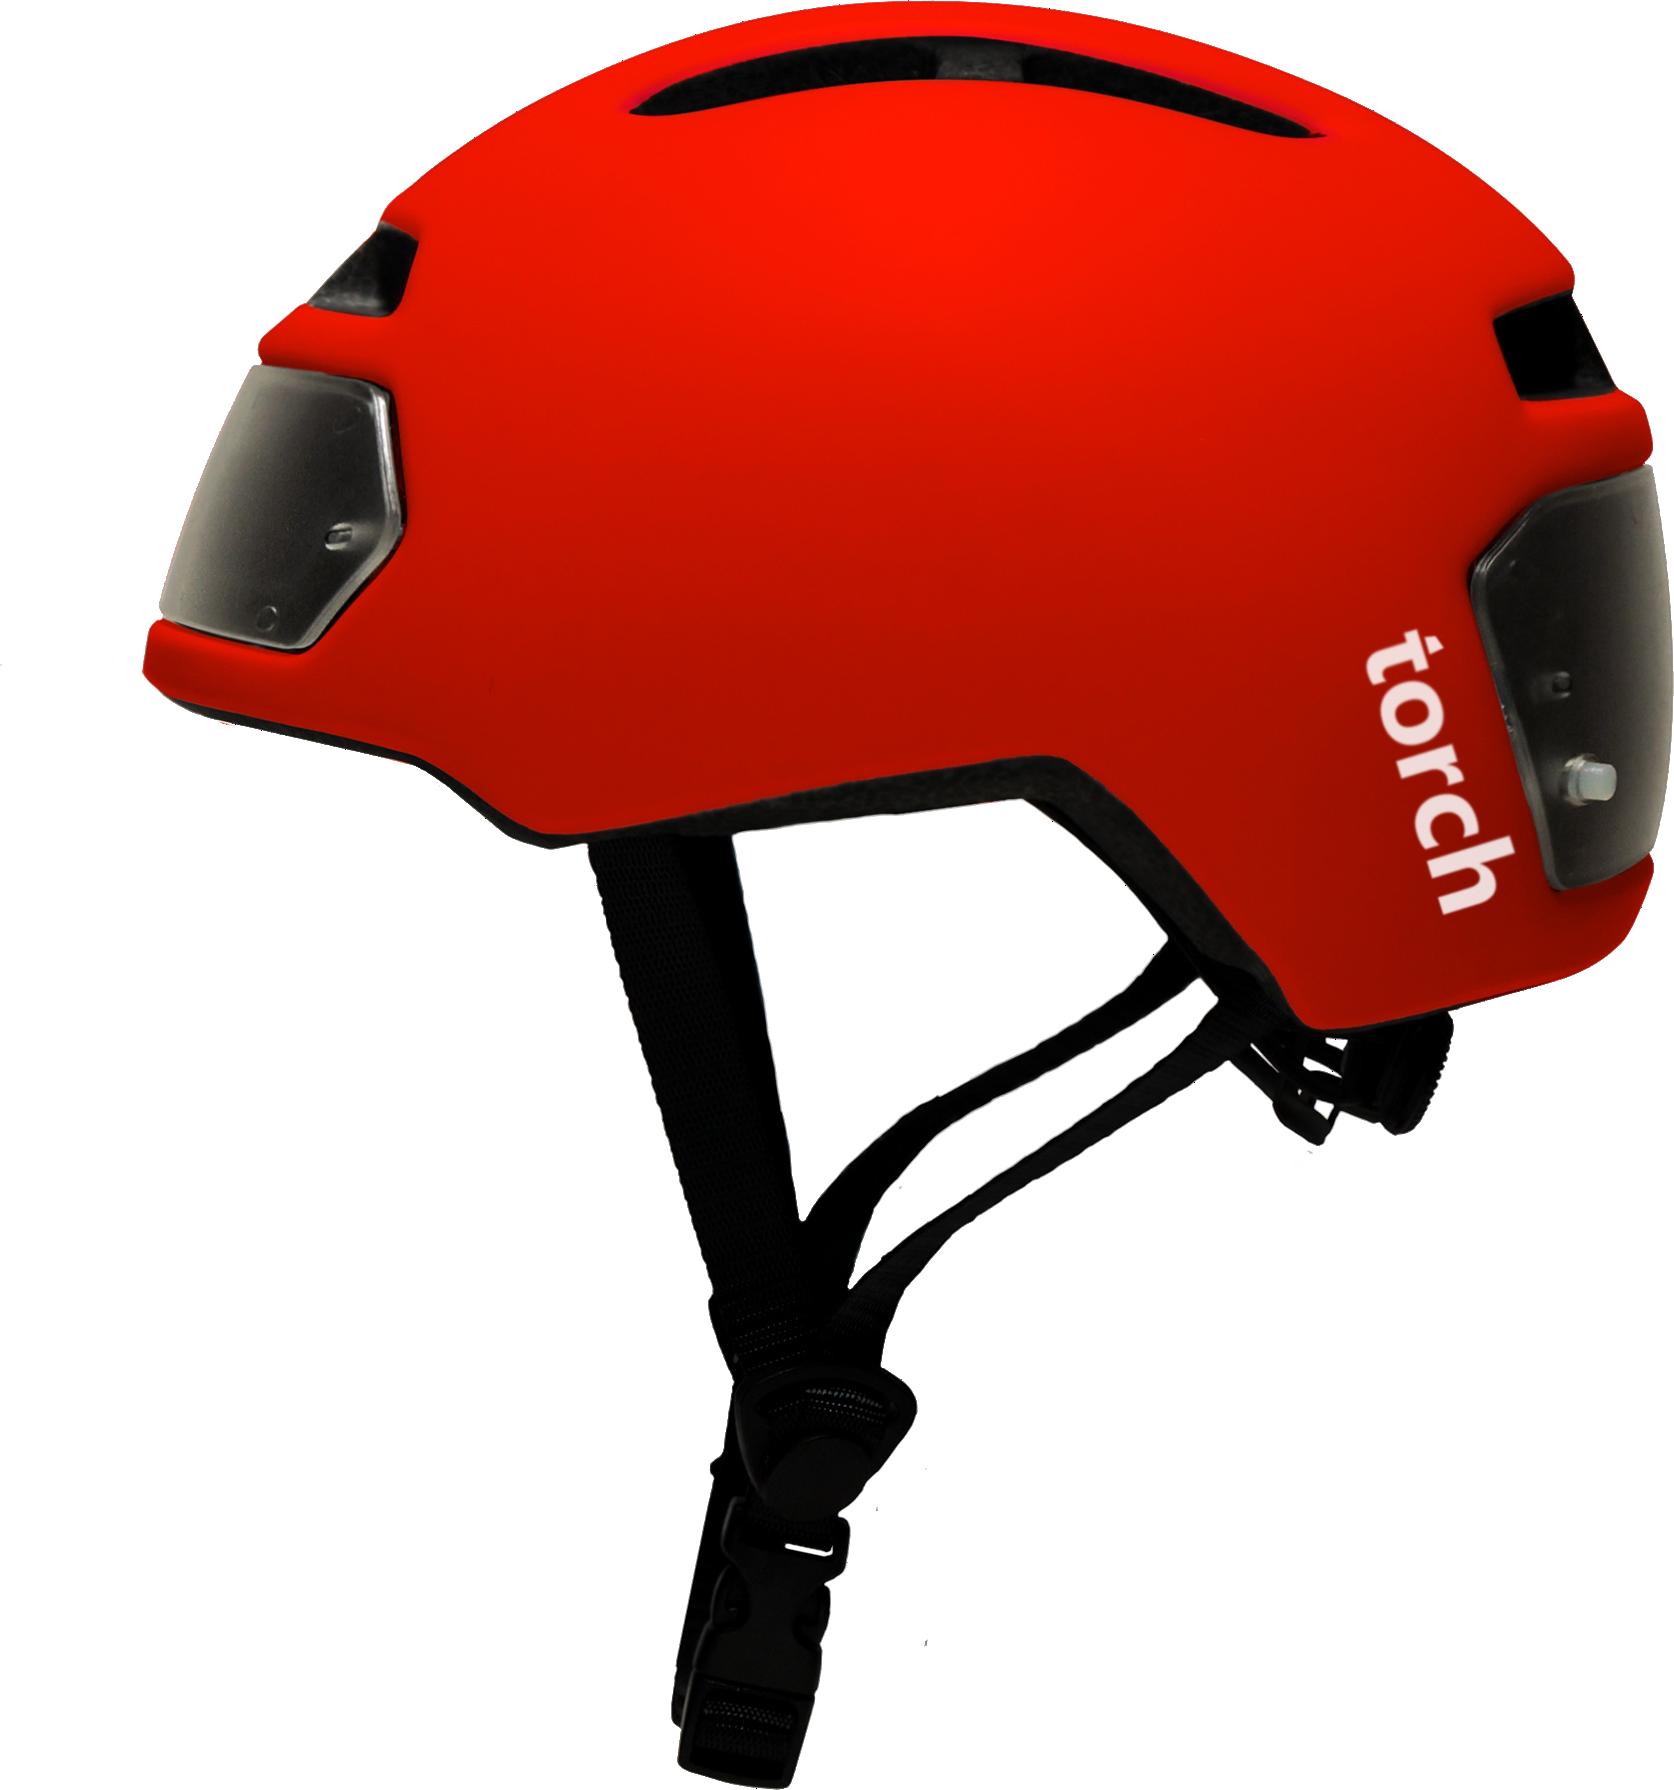 Race clipart dirt bike helmet. Bicycle png image